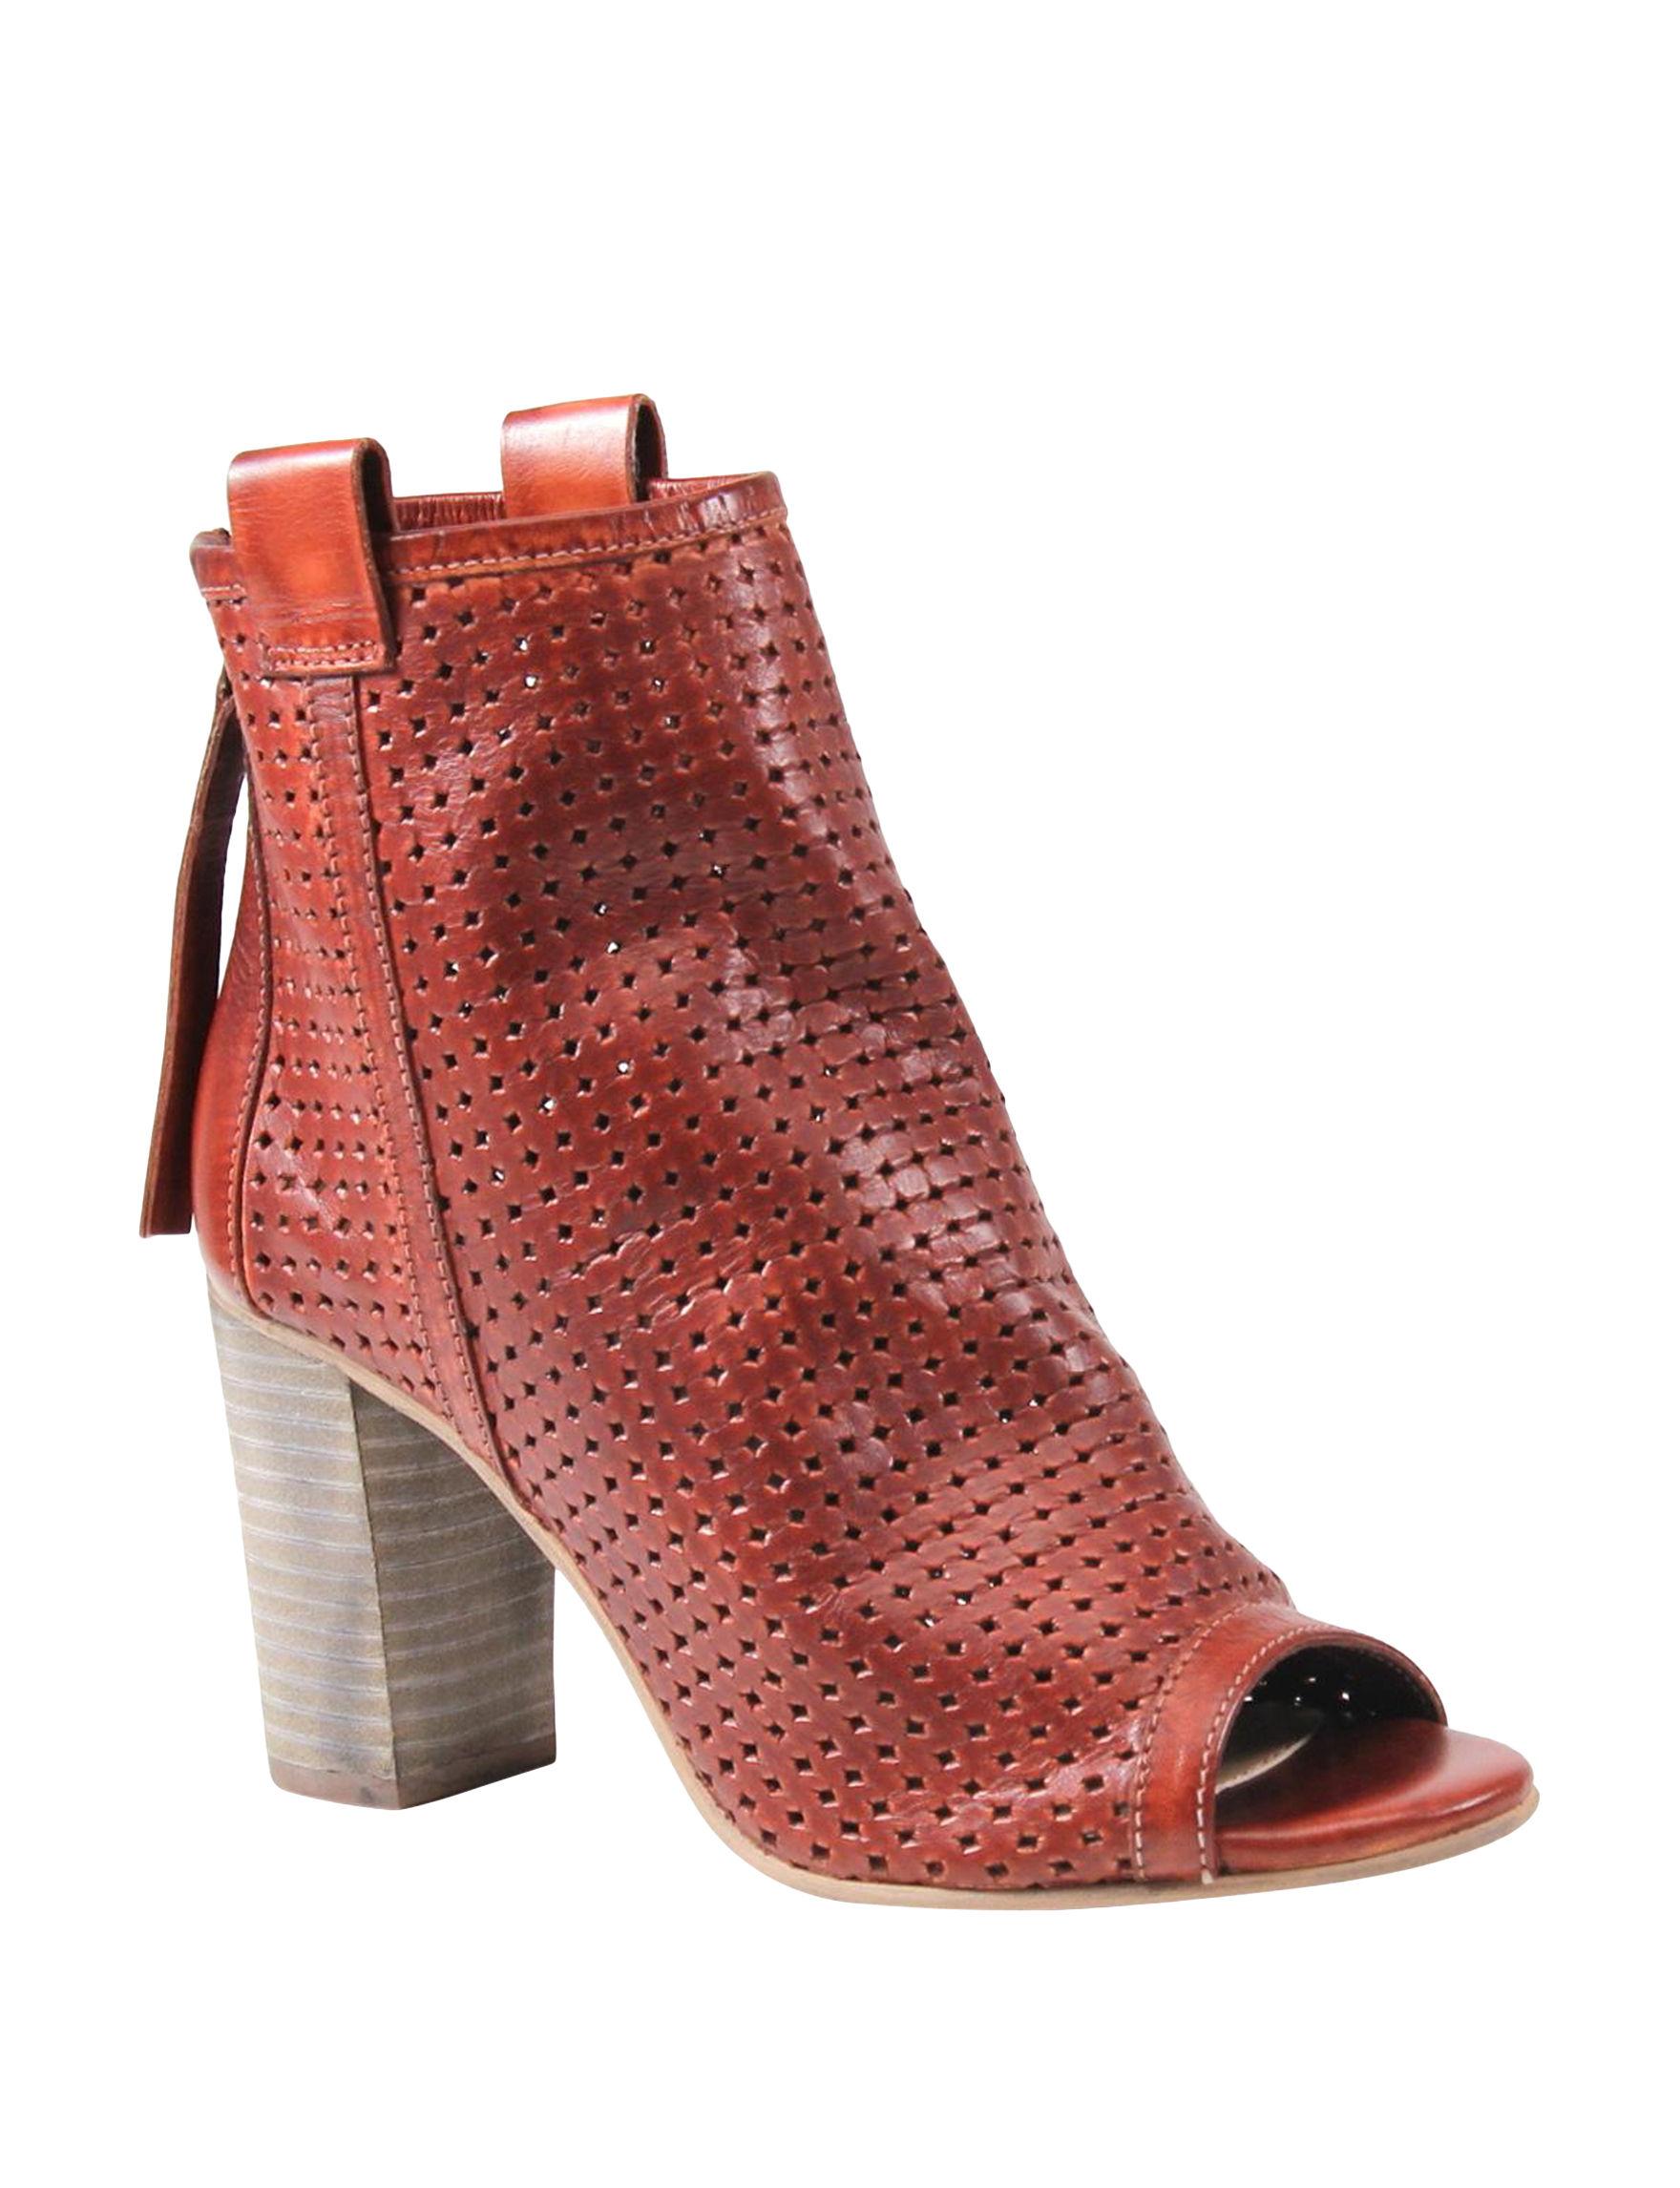 Diba True Tan Ankle Boots & Booties Peep Toe